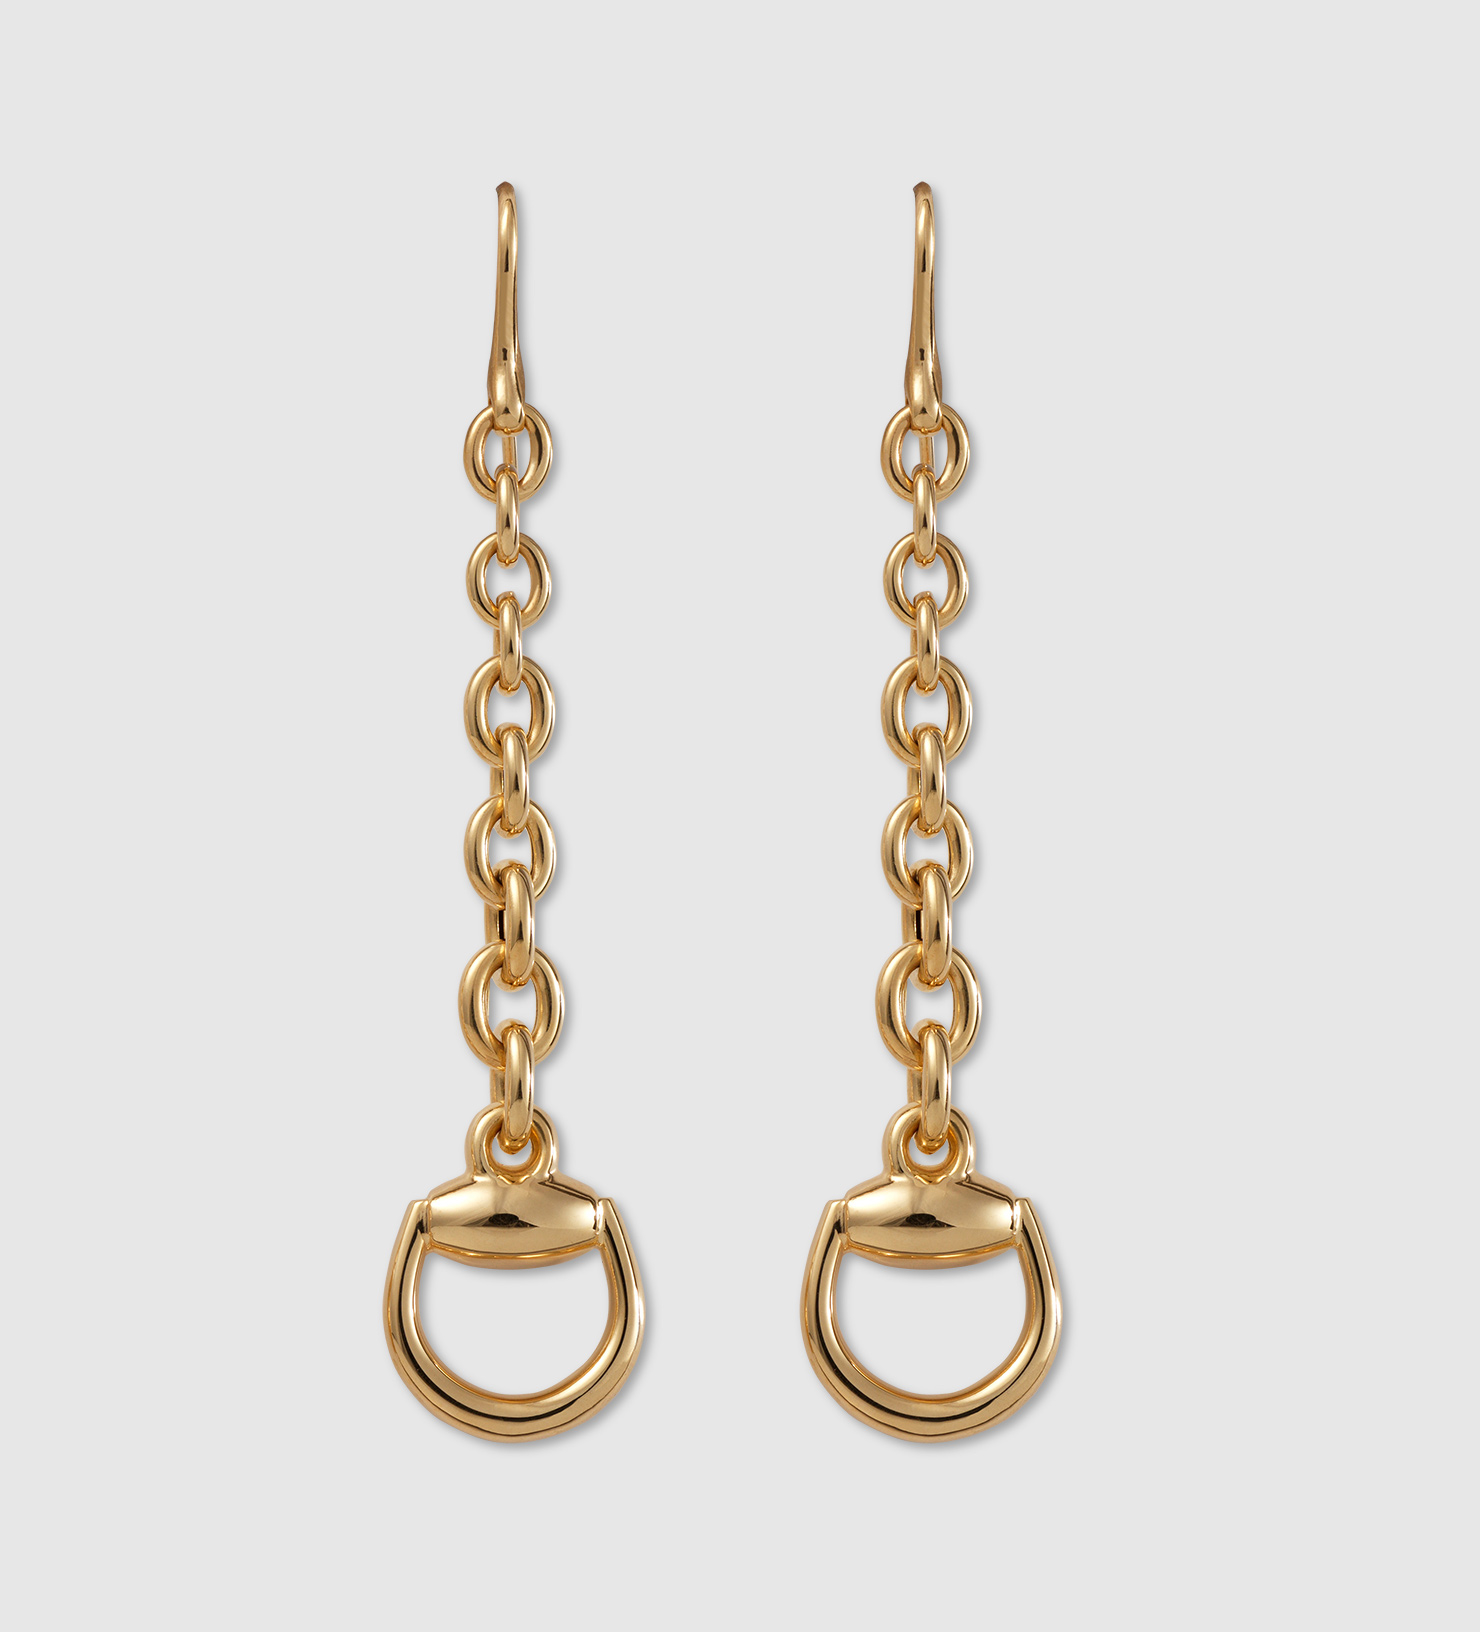 2f45f9023 Gucci Horsebit Earrings In Yellow Gold in Yellow - Lyst